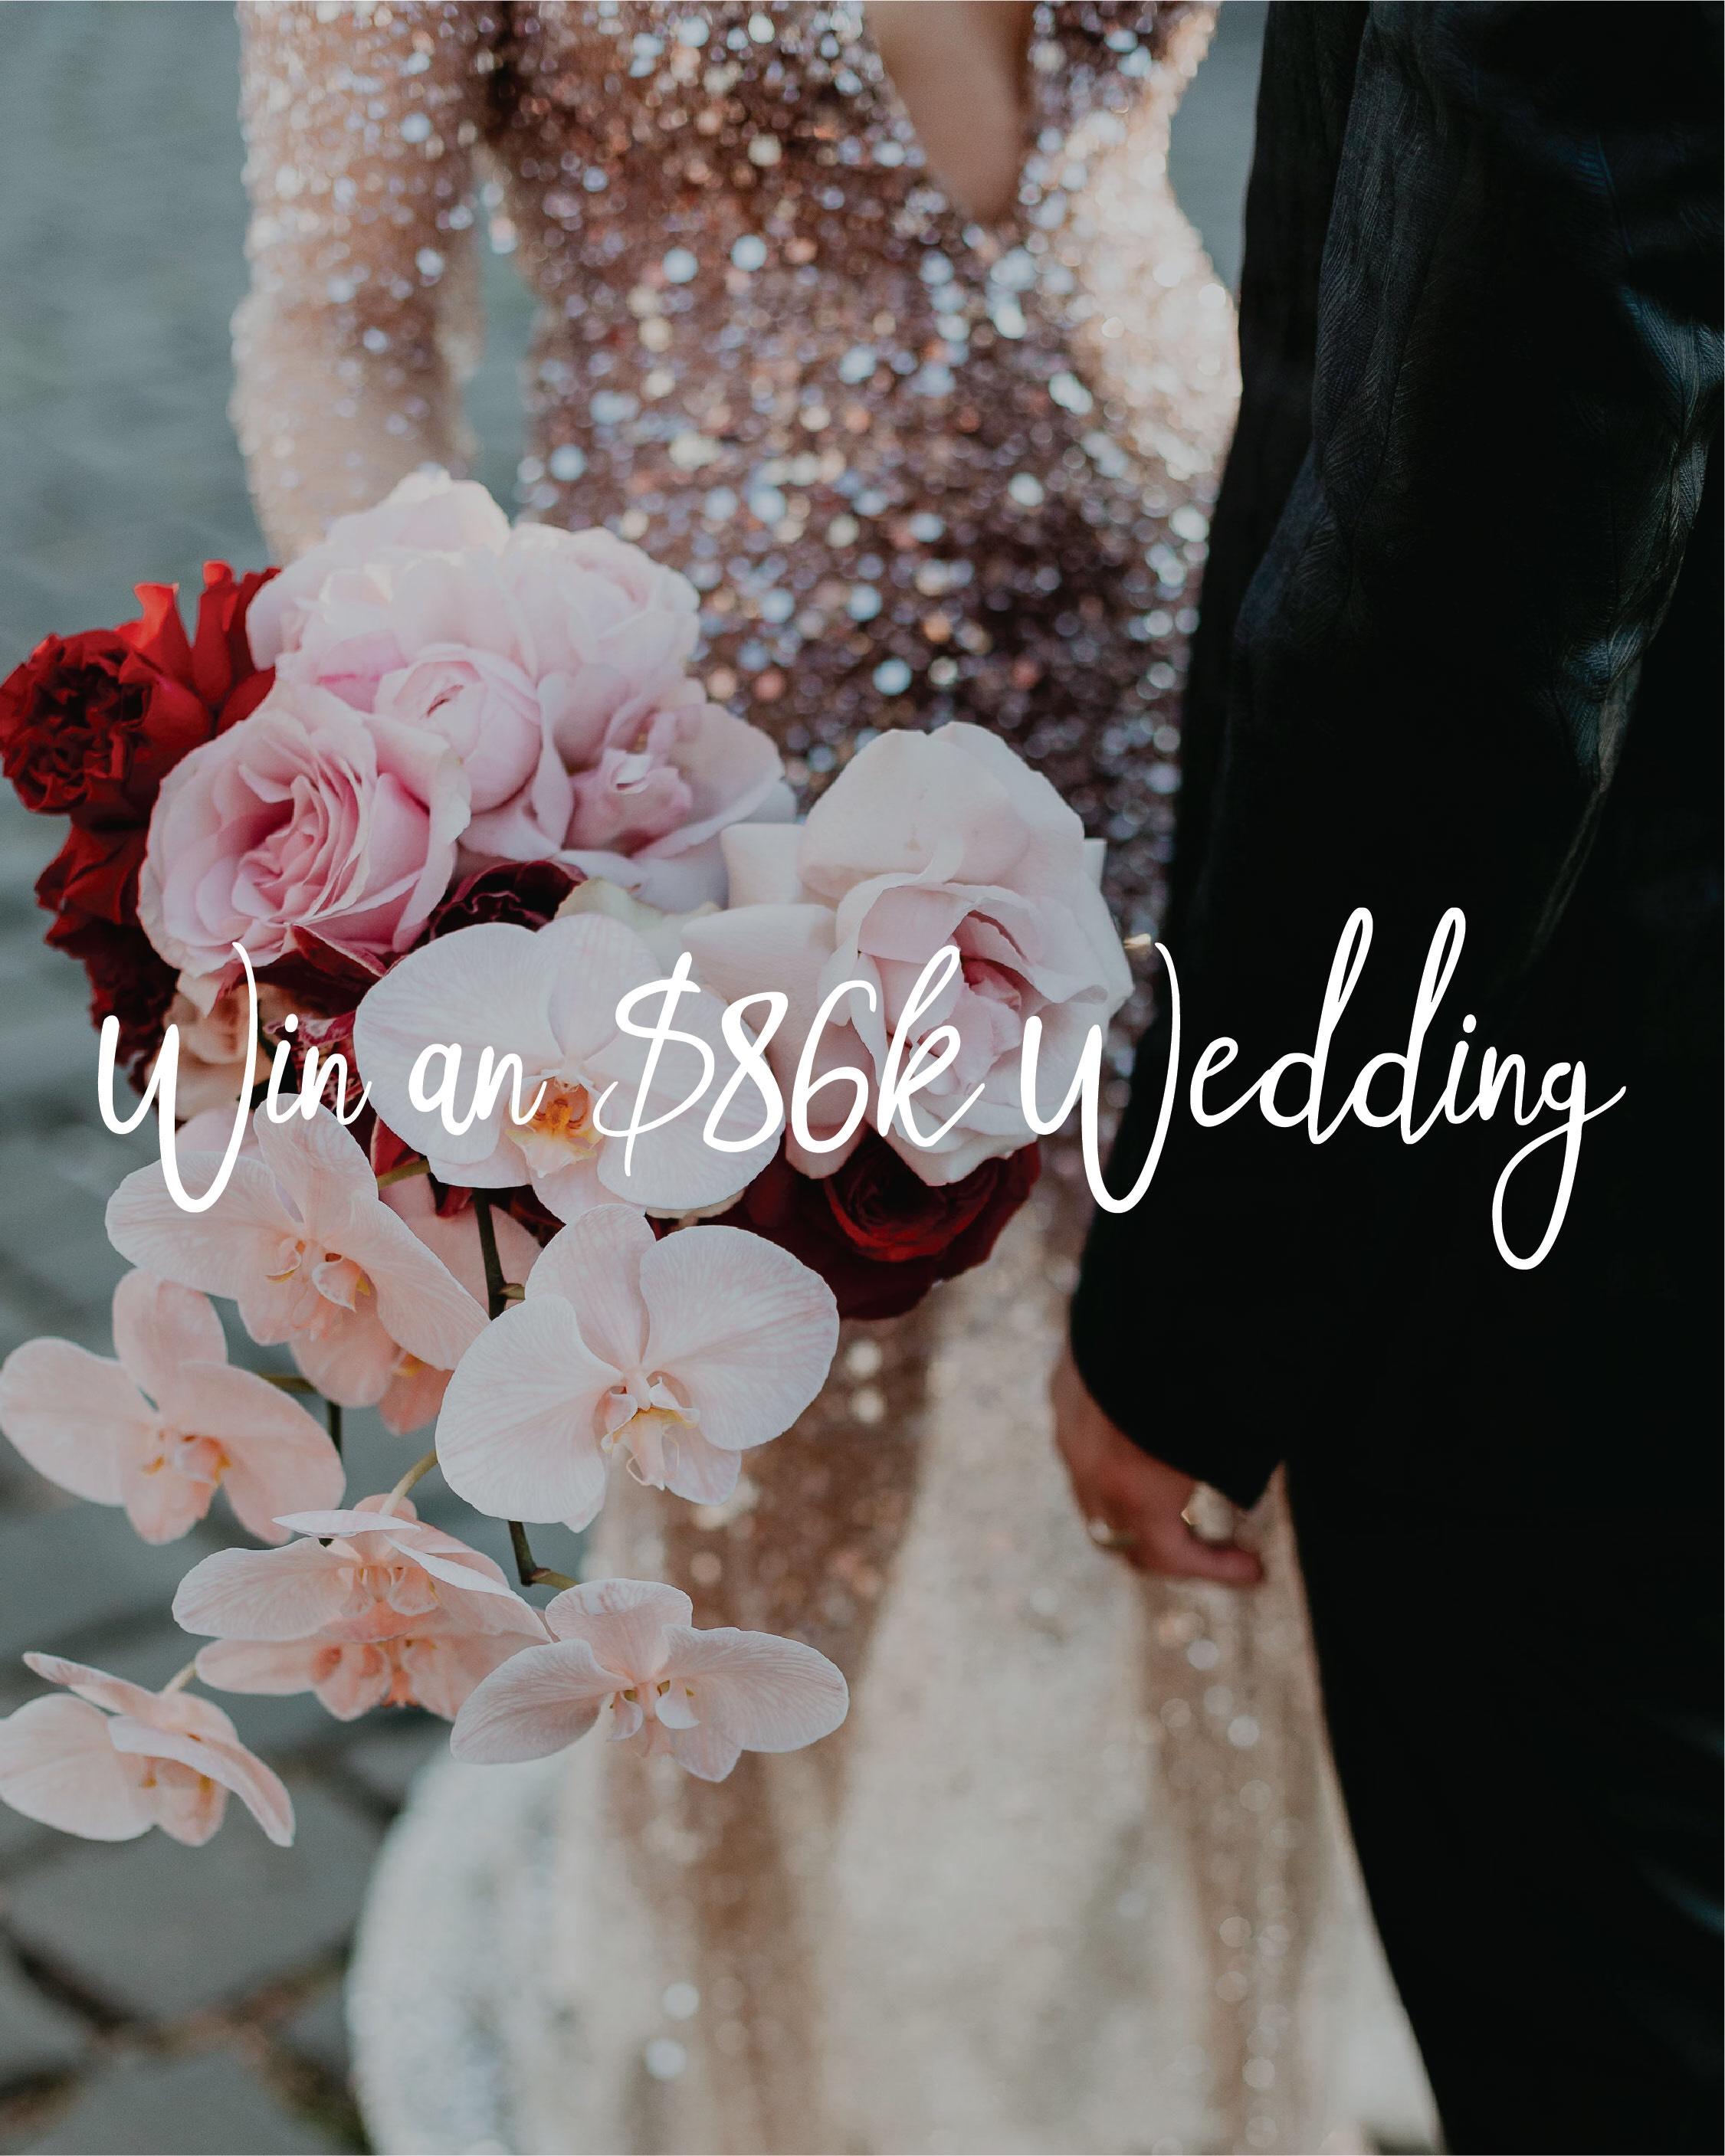 OCRH_Win a Wedding_Instagram_DC5_Win a $85k Wedding v2.jpg